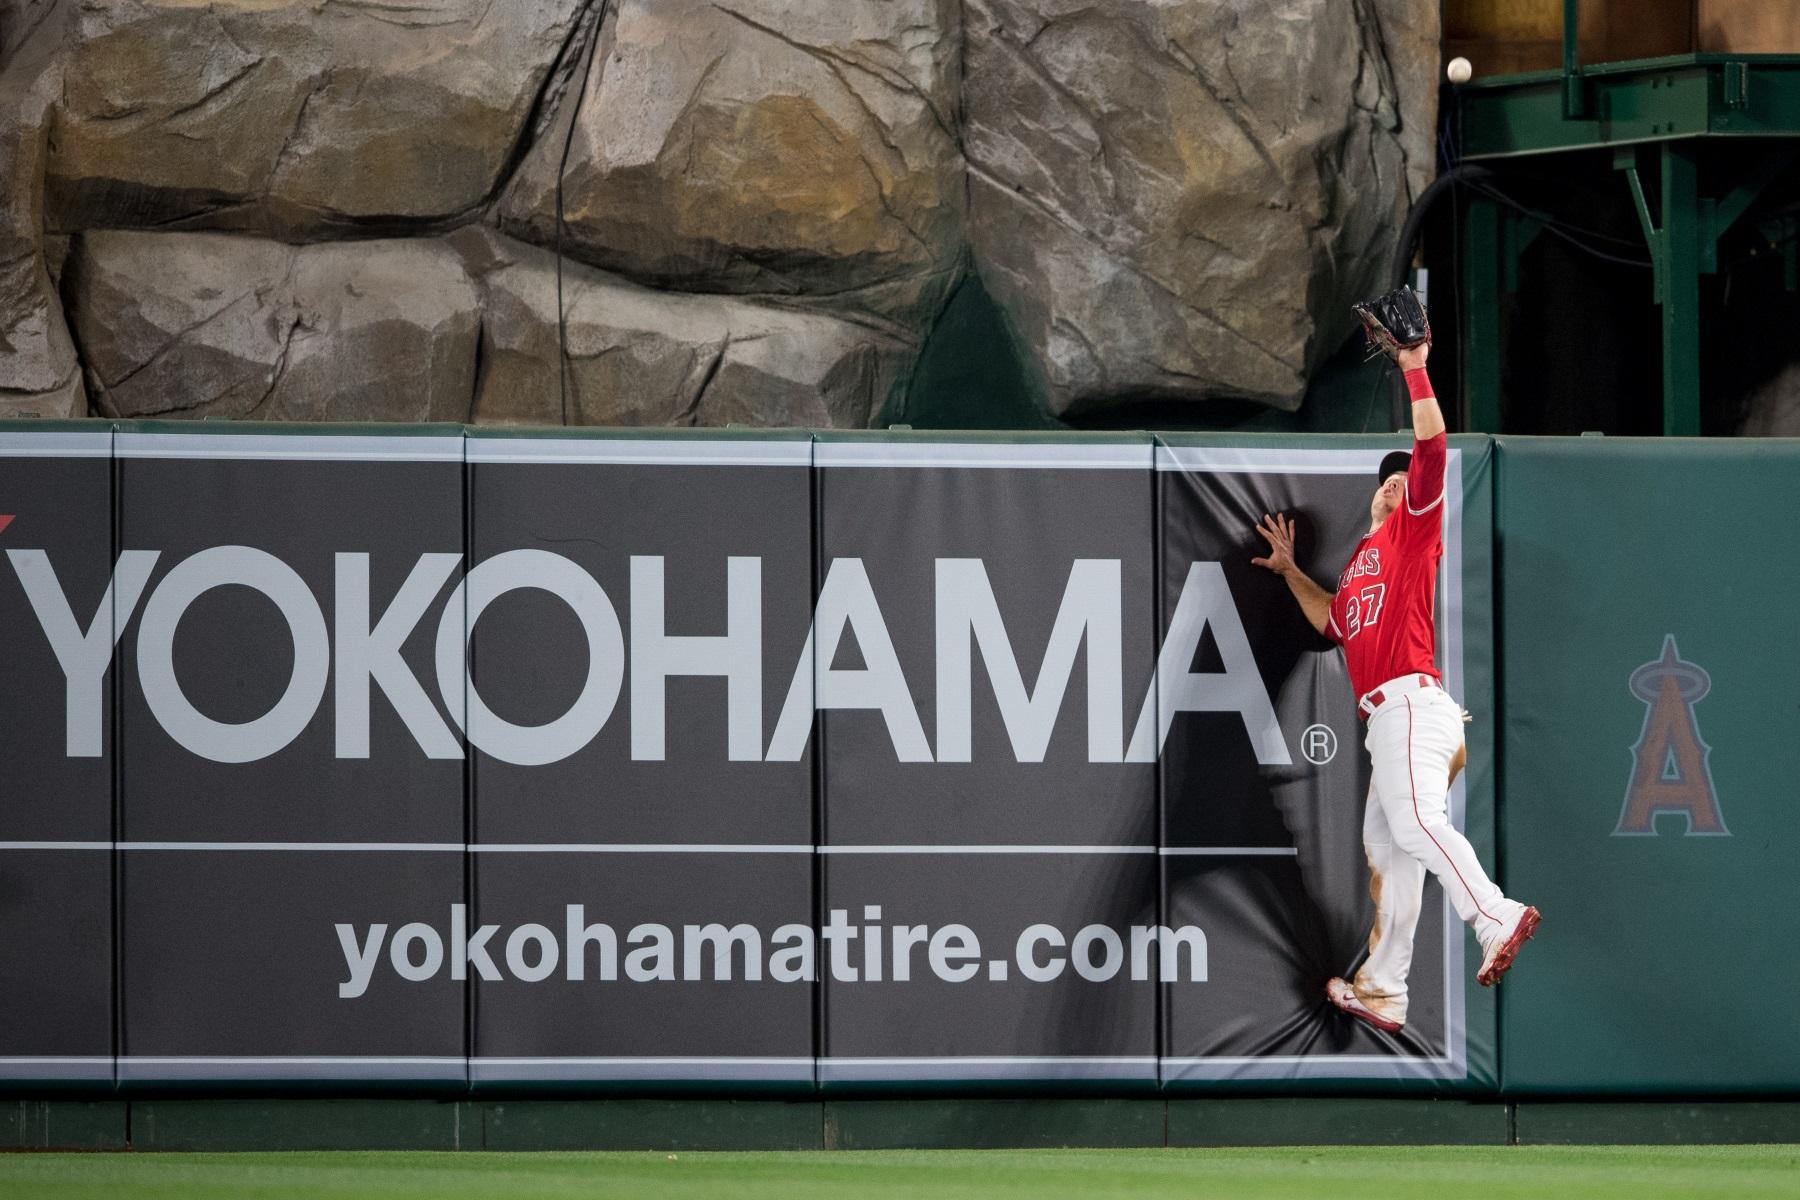 Yokohama продлила соглашение с Los Angeles Angels